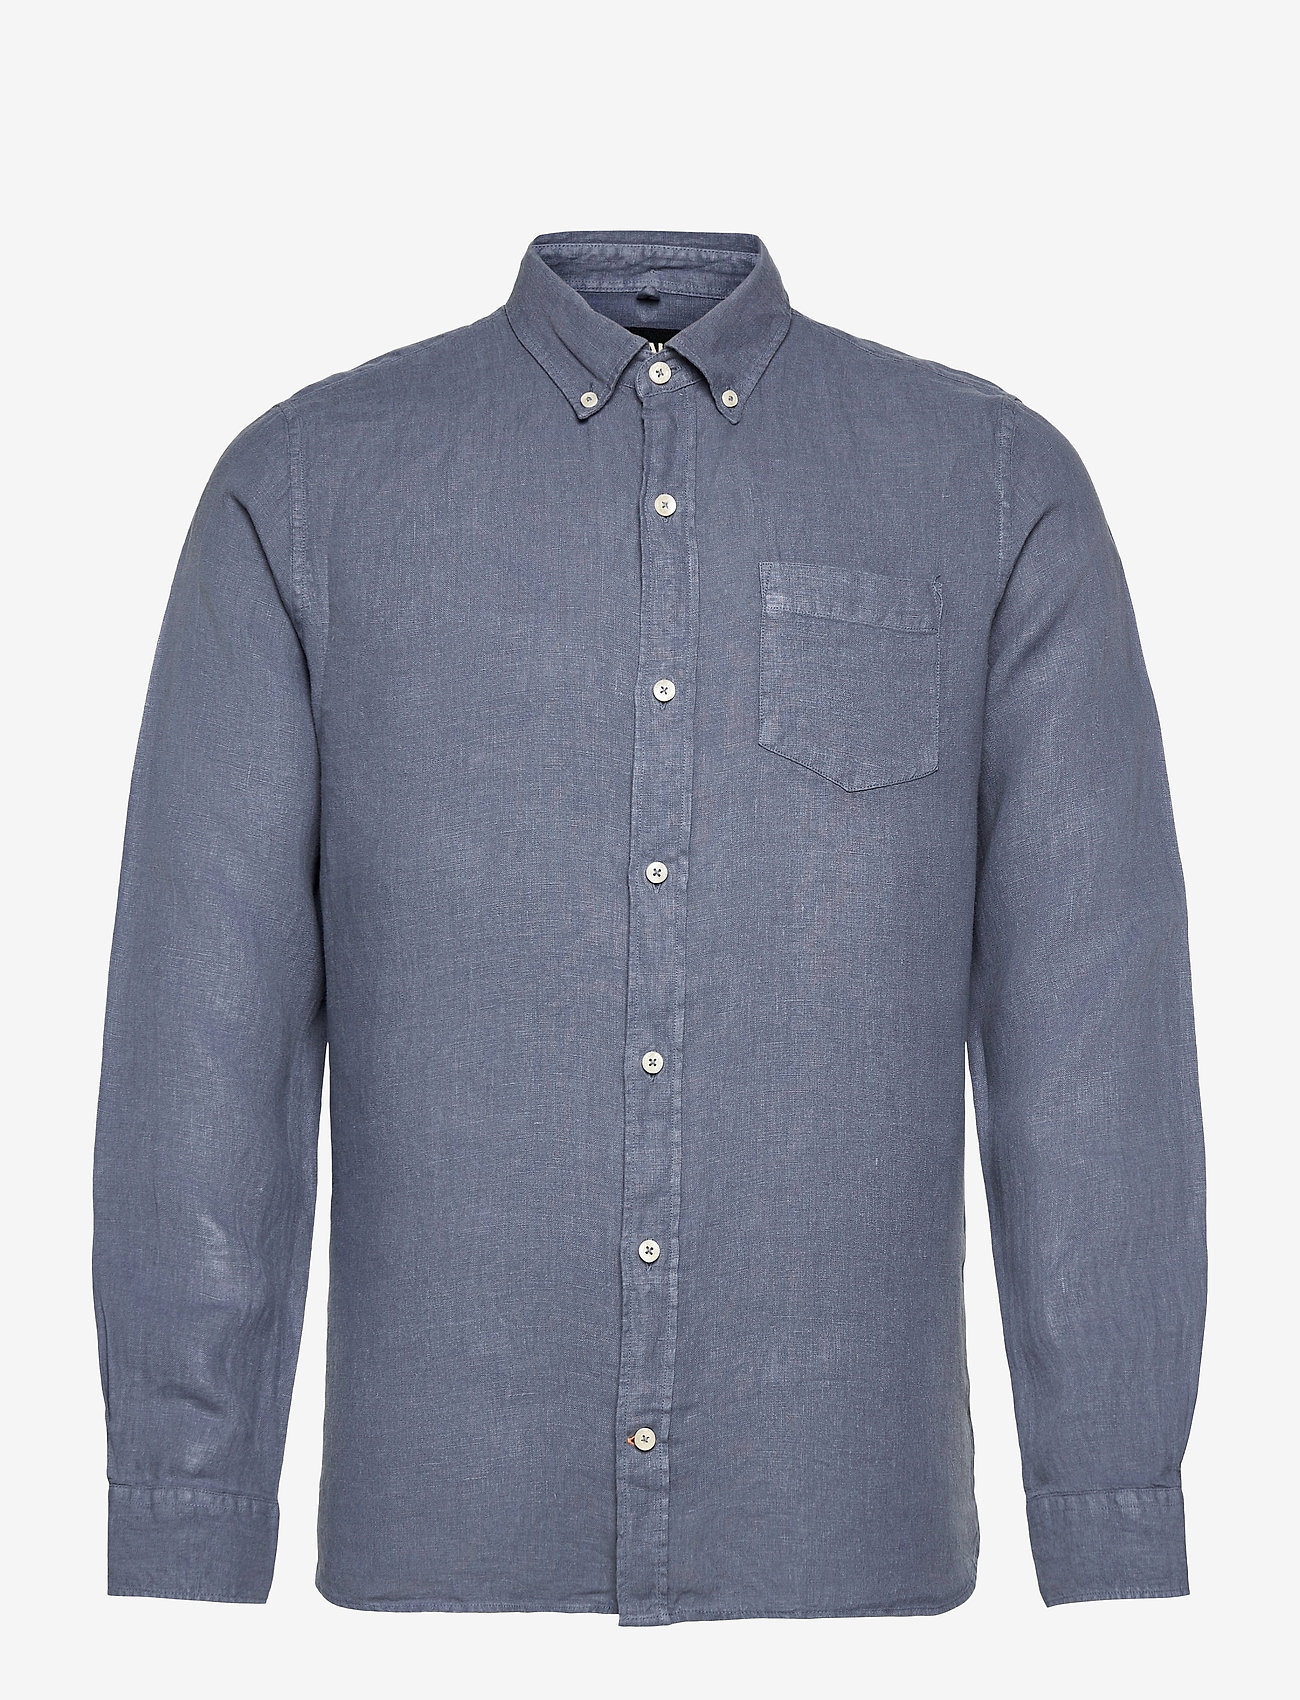 ECOALF - MALIBU SHIRT MAN - chemises à carreaux - grey blue - 0